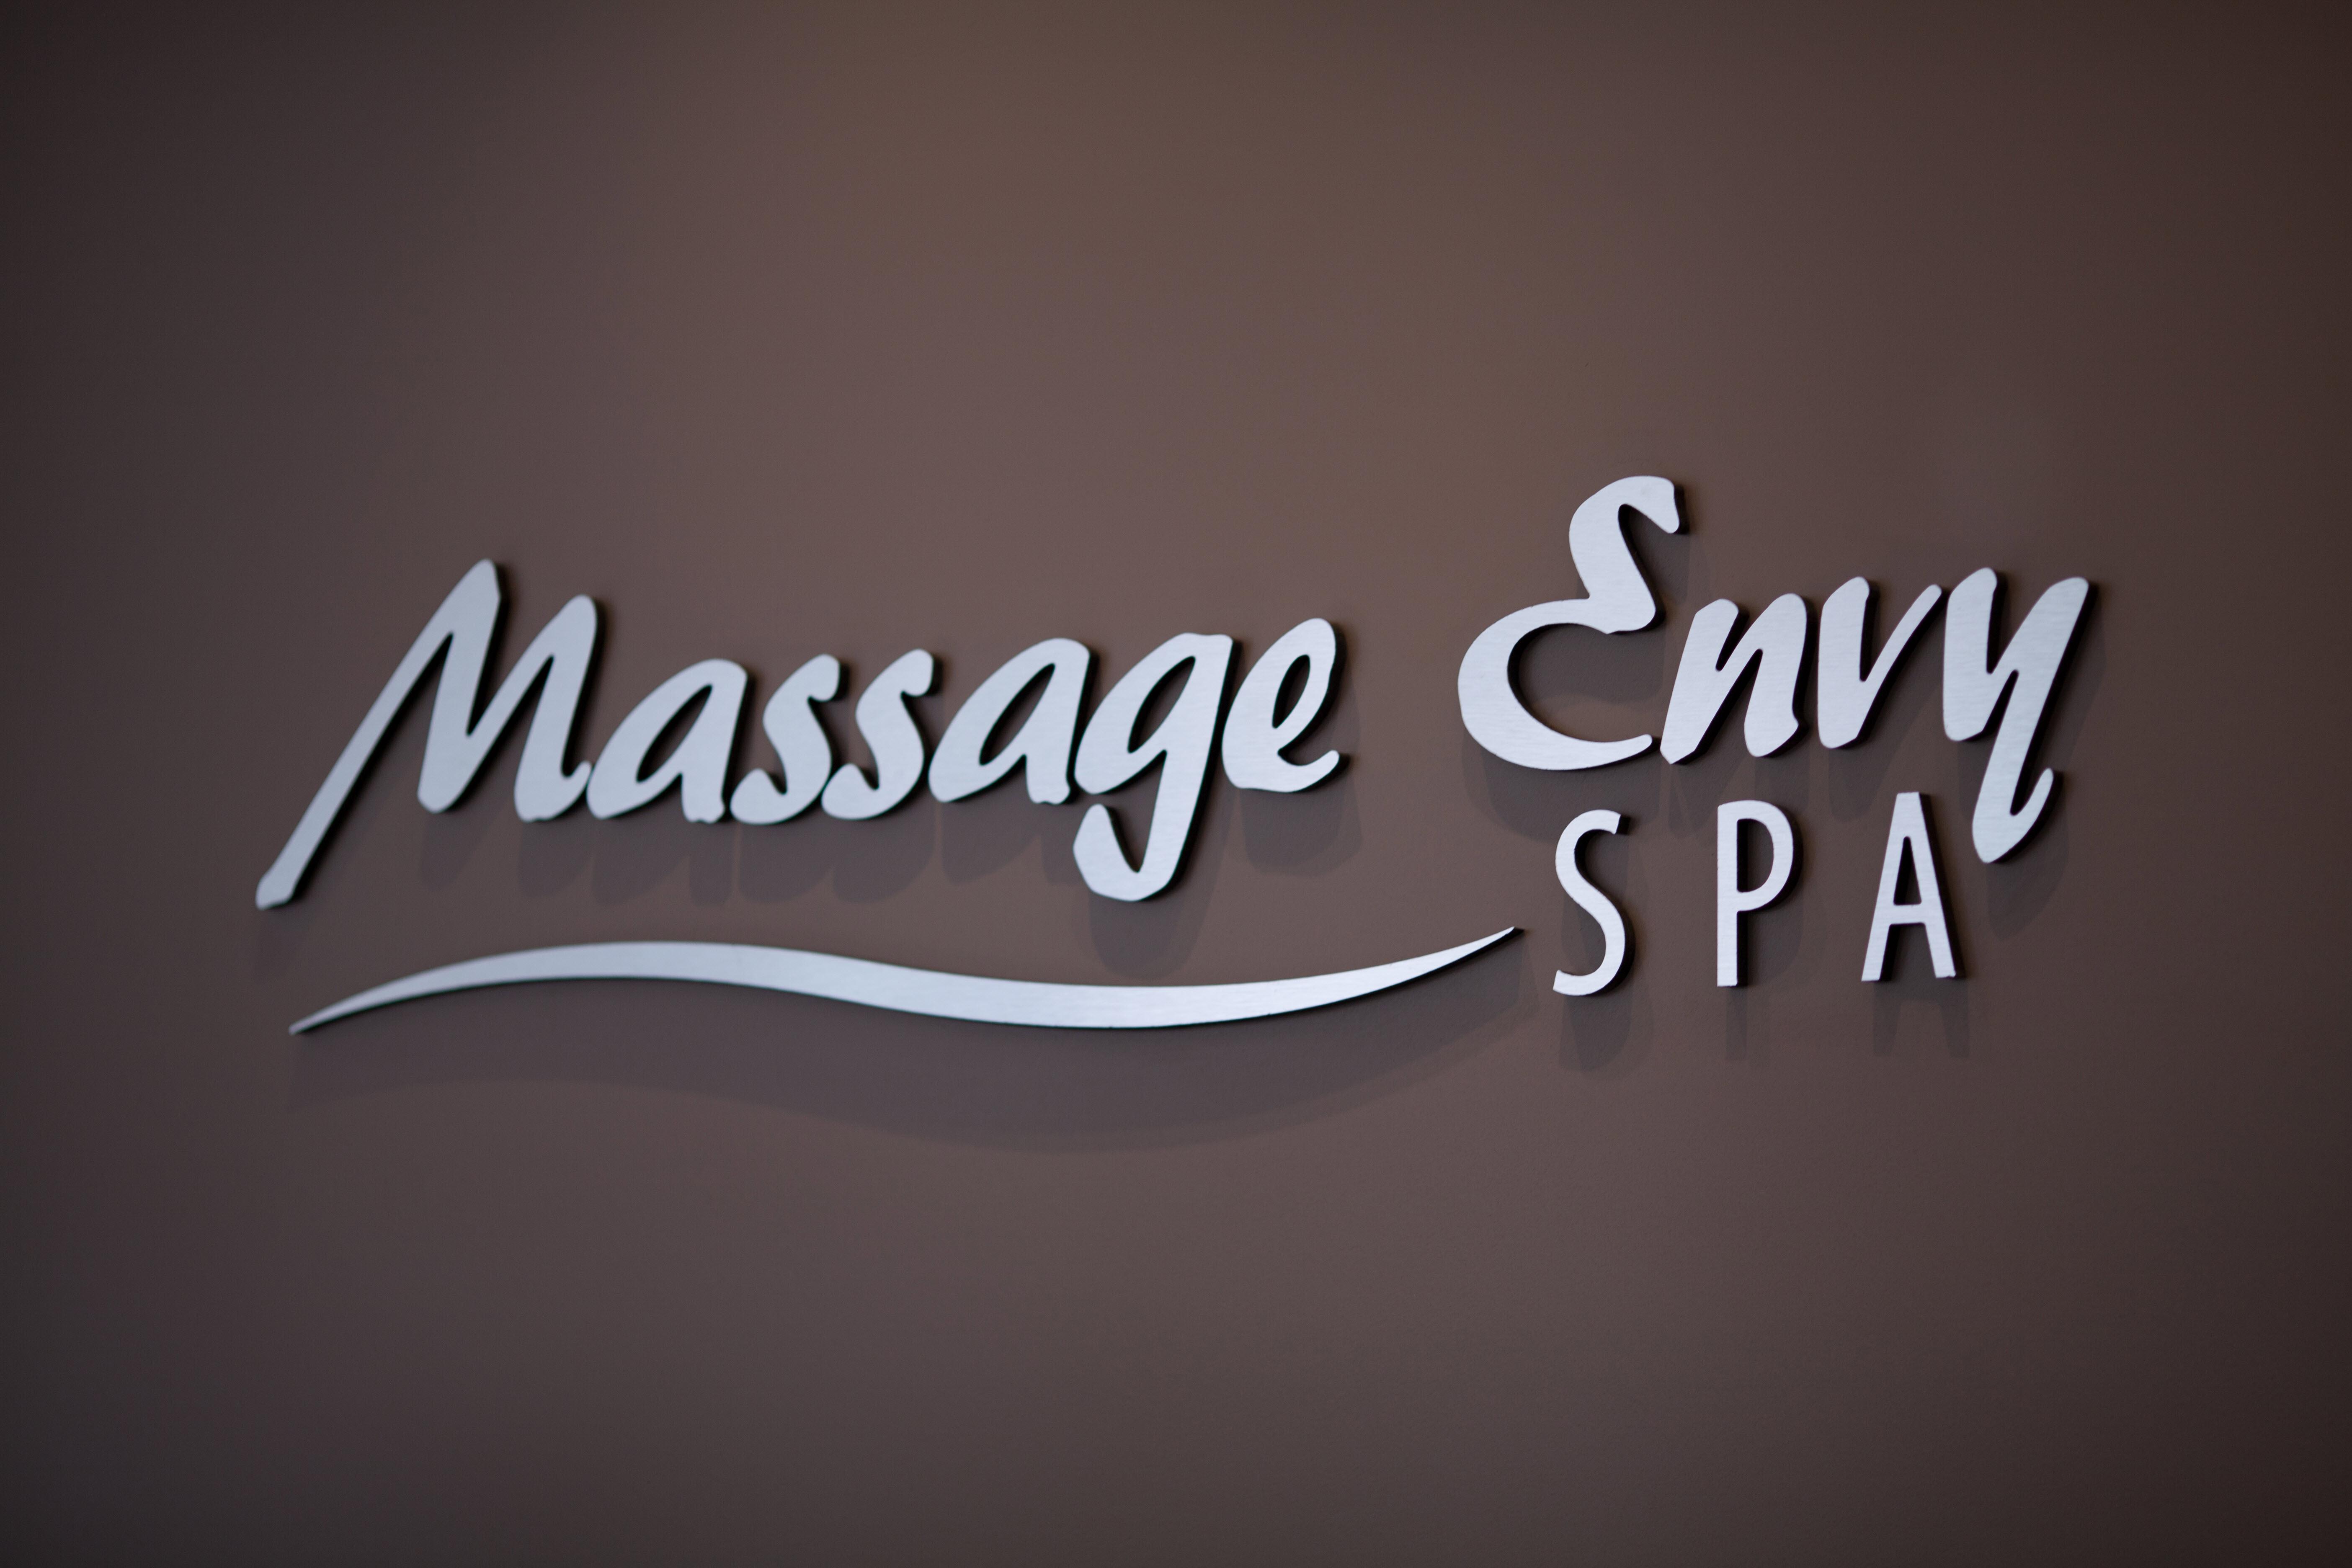 Massage Envy Spa - Tikahtnu Commons